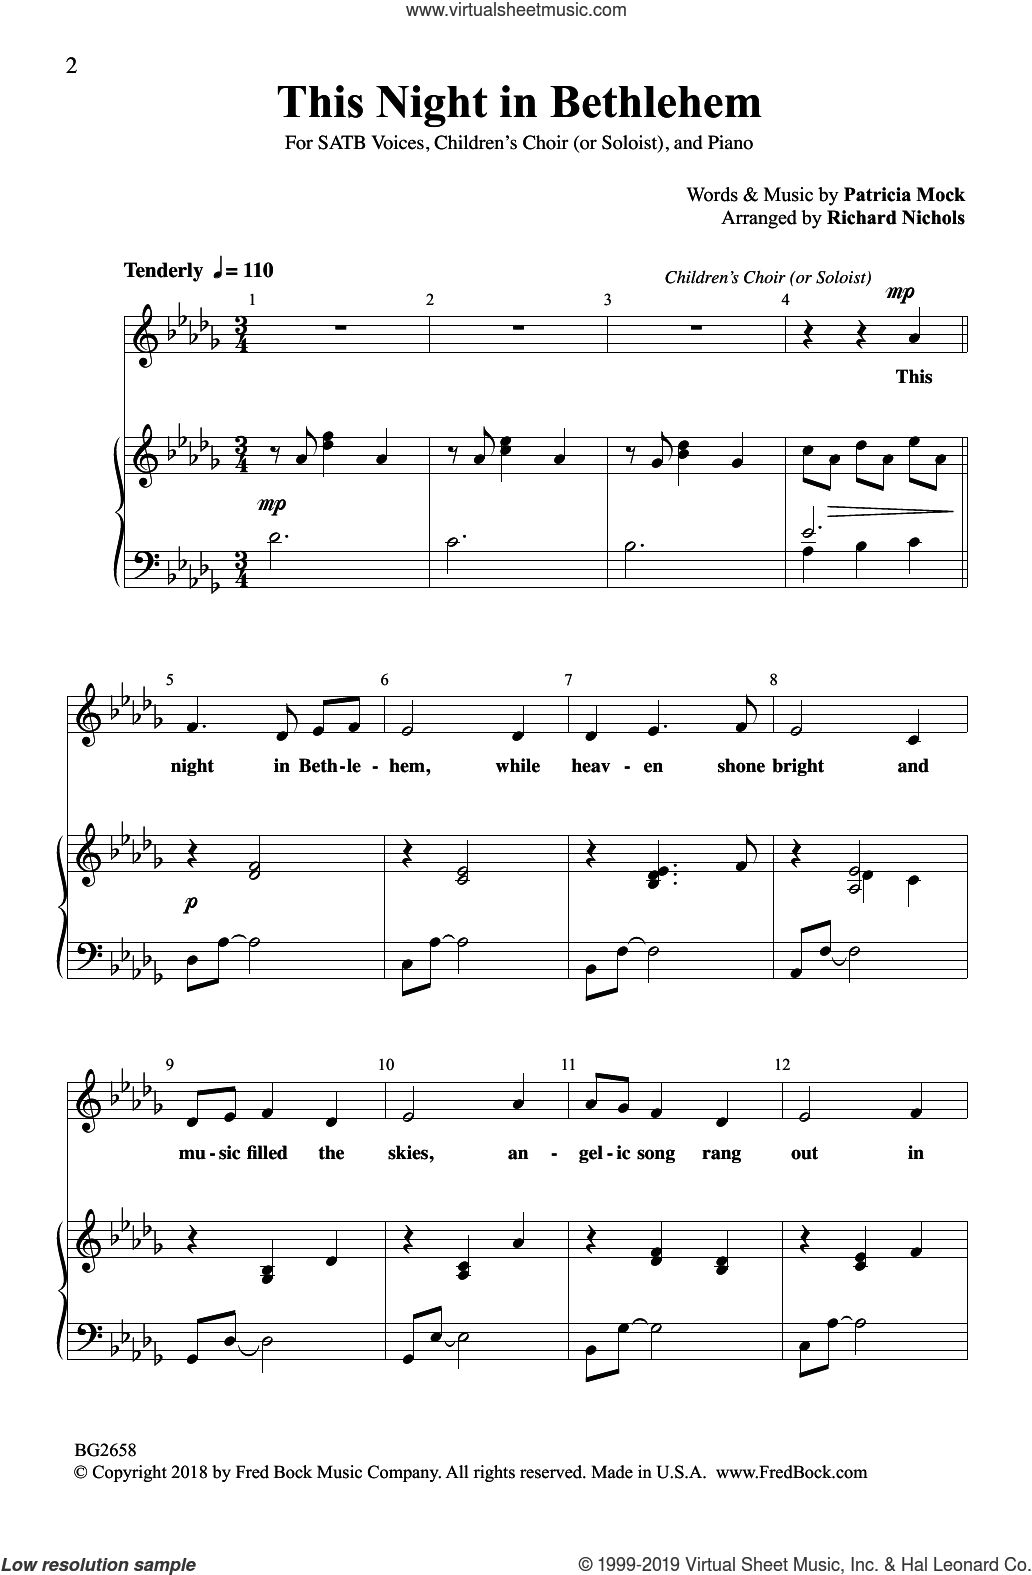 This Night In Bethlehem (arr. Richard Nichols) sheet music for choir (SATB: soprano, alto, tenor, bass) by Patricia Mock, intermediate skill level